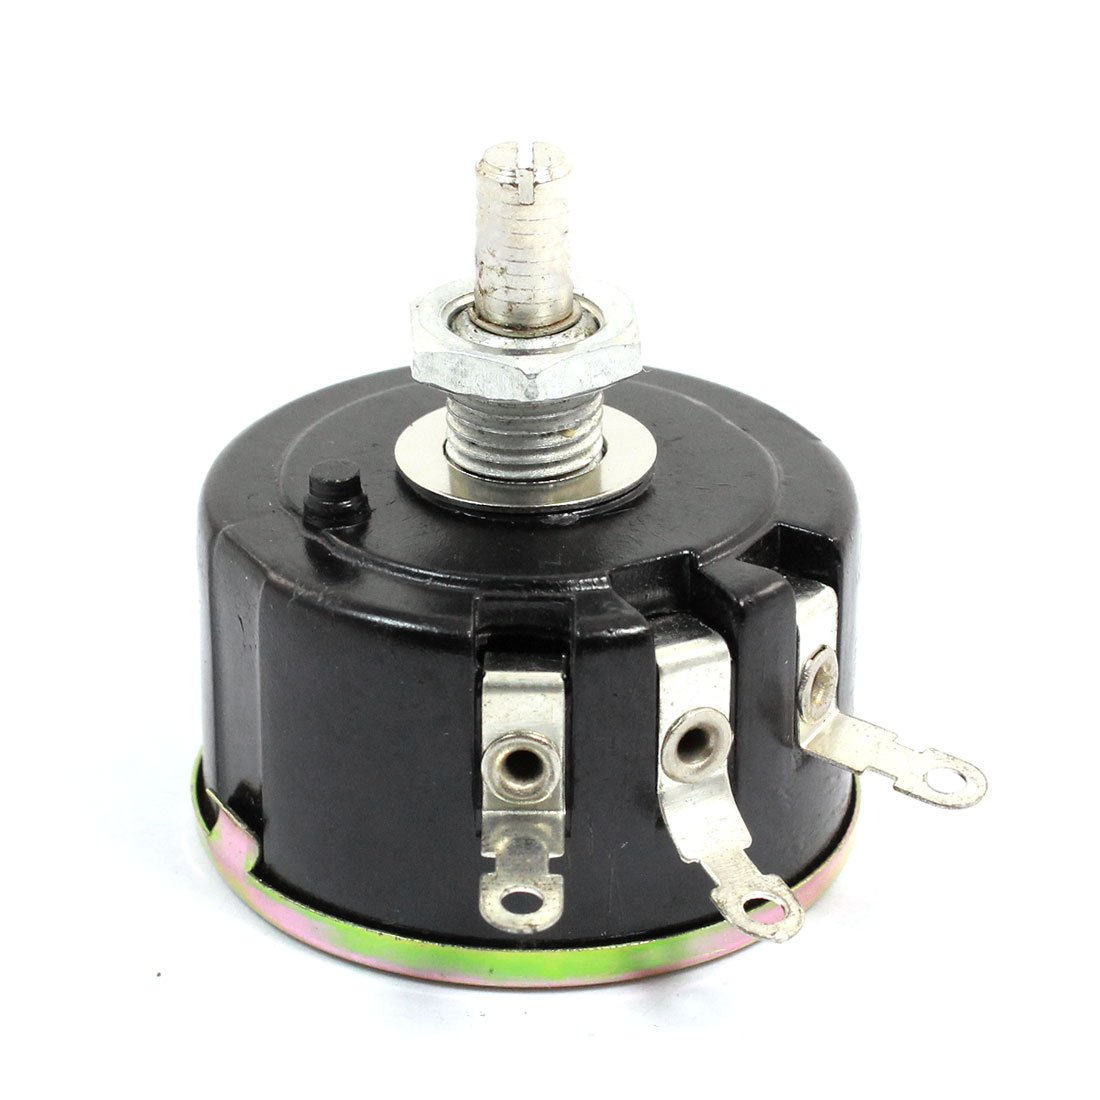 sourcingmap 6mm Arbre Single Tours fil enroulé Potentiomètre Rotatif 47K Ohm 5W 5 watts US-SA-AJD-46358